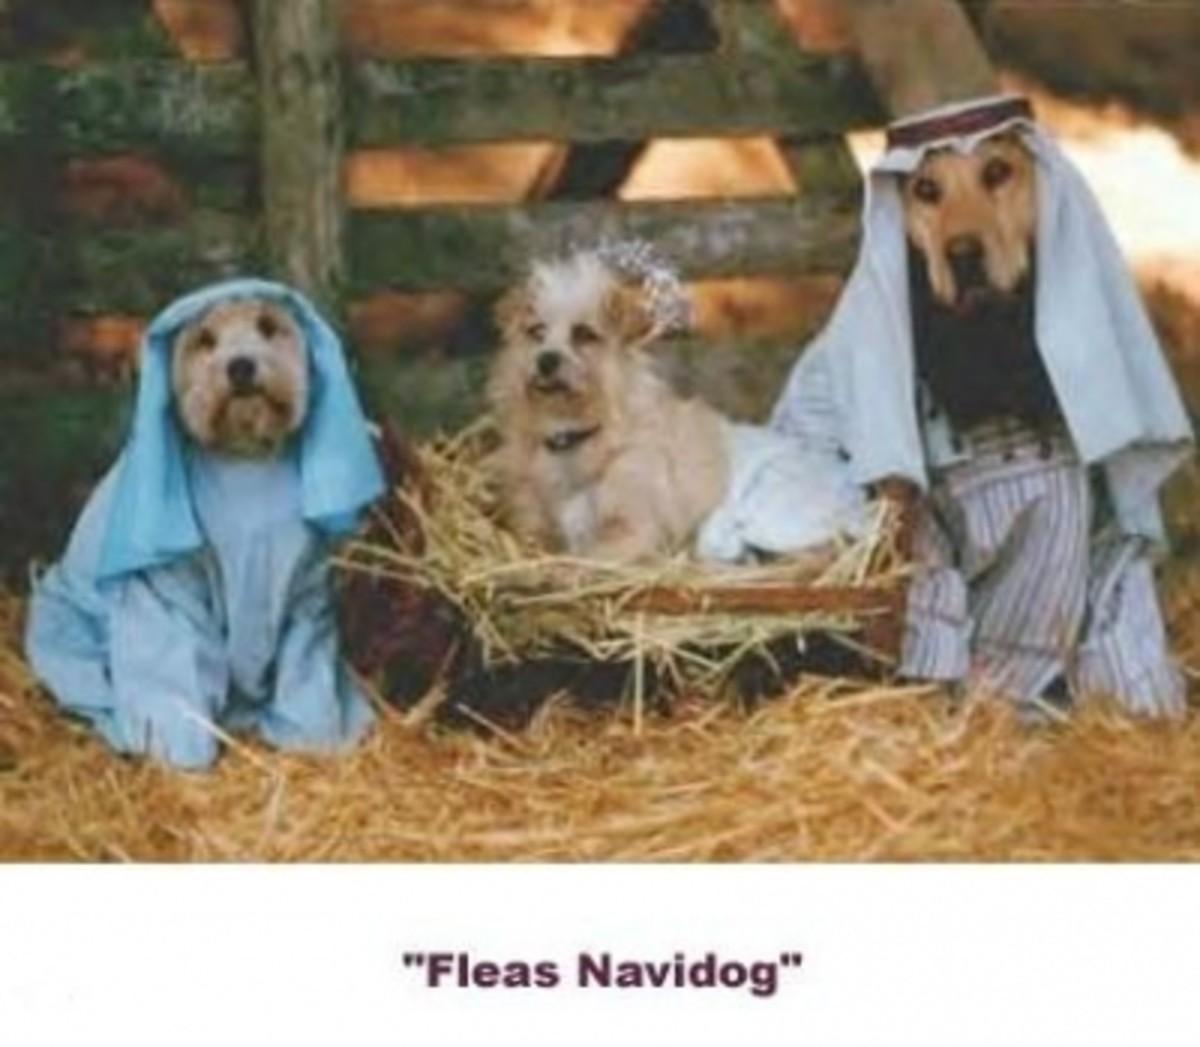 30 - Fleas Navidog